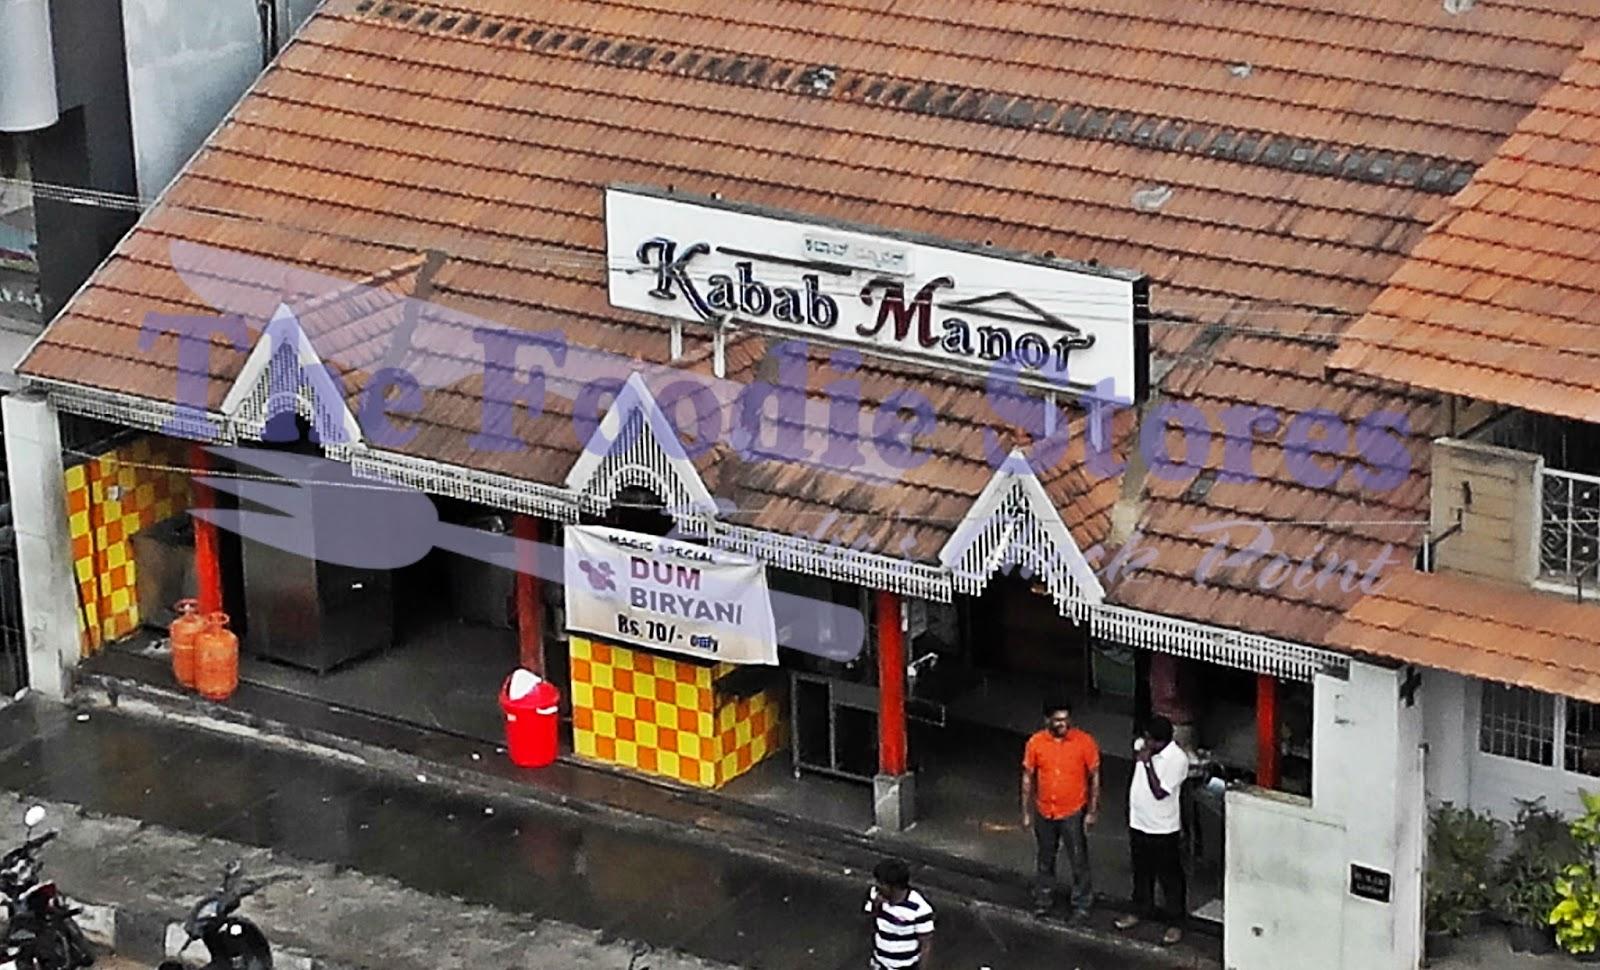 Kabab Manor, RT Nagar, Bangalore